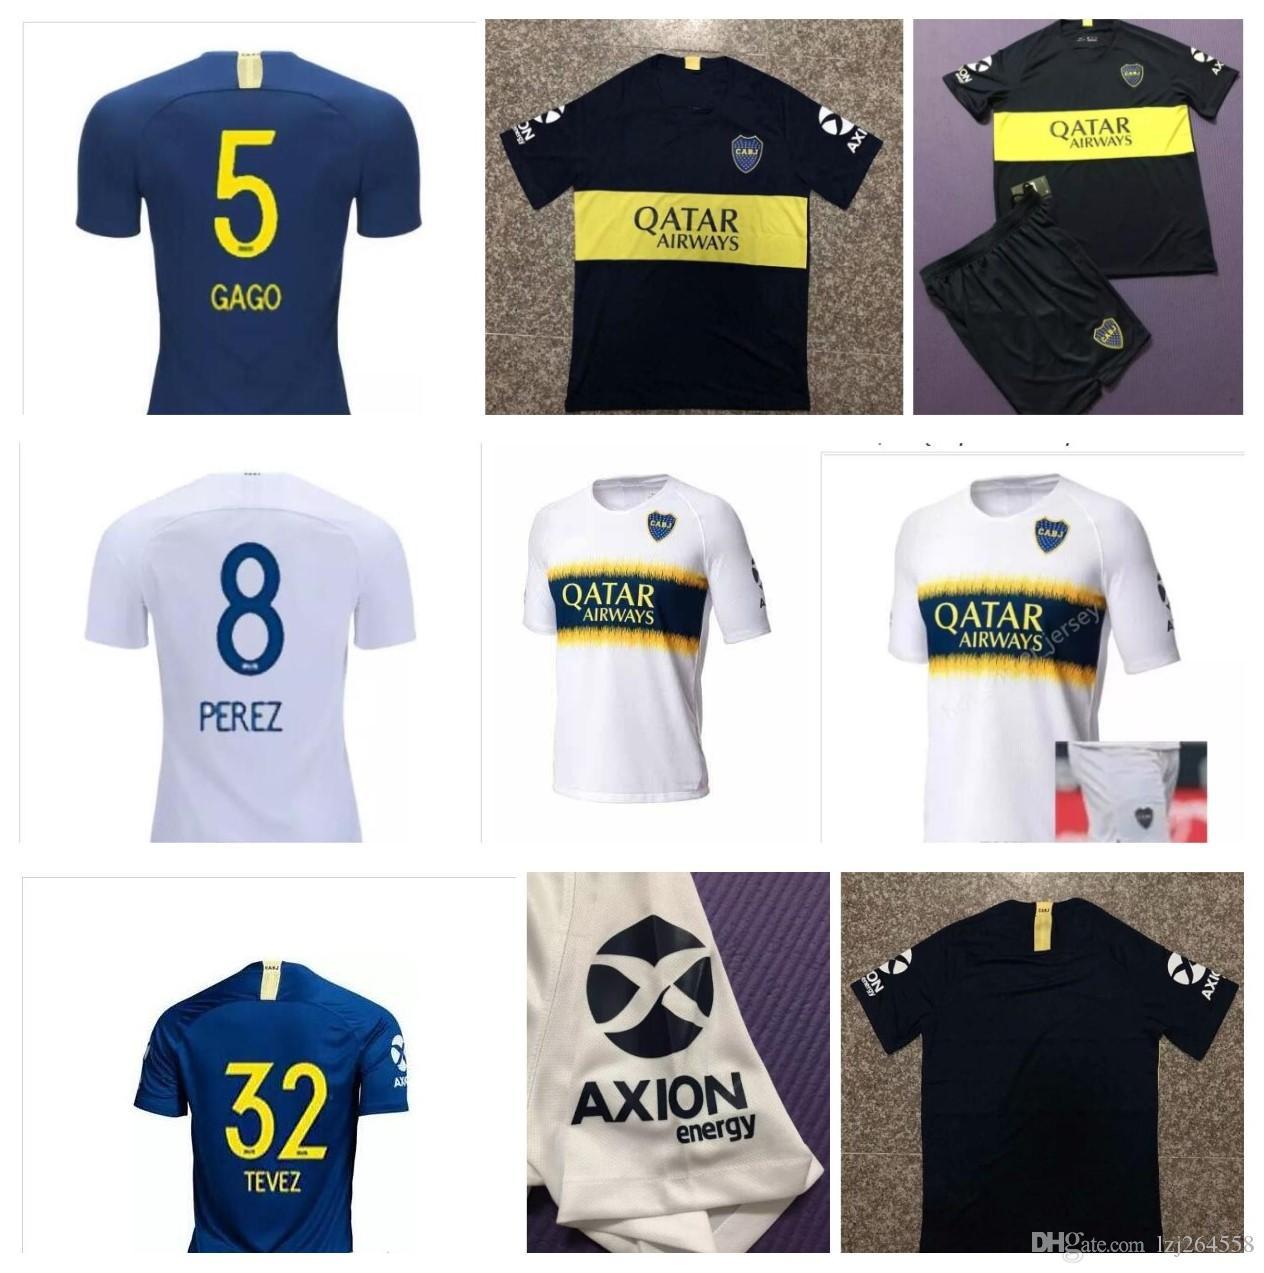 New 2018 Camisa Boca Juniors Jersey 2019 Soccer Jerseys Chandal Football  Shirt GAGO OSVALDO Uniforms Camisetas De Futebol TOP TEVEZ Custom UK 2019  From ... dd6d40cefb2fd